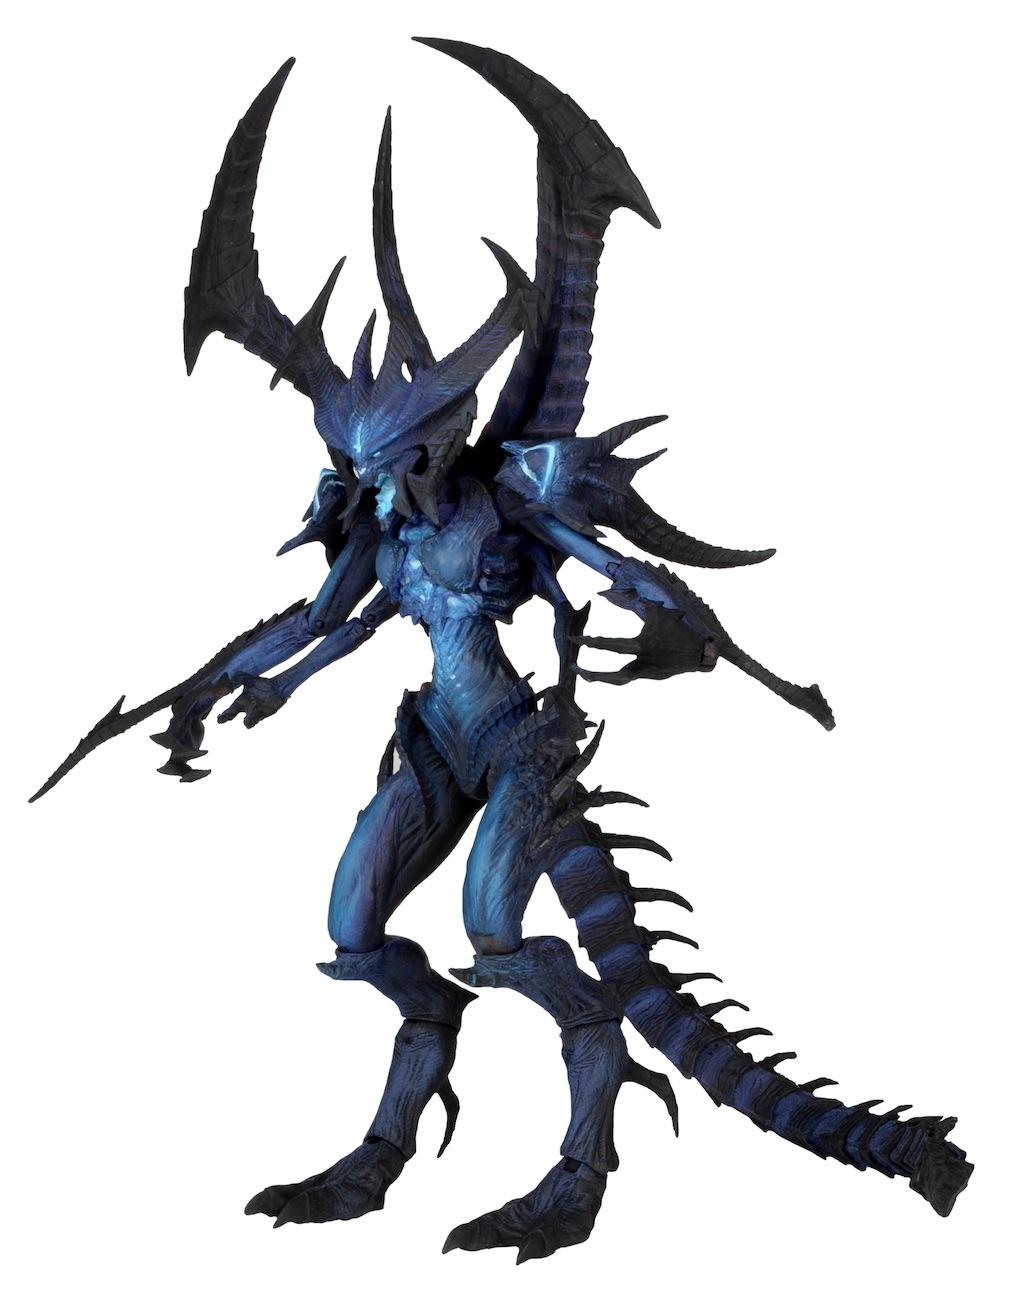 [NECA] Diablo III – Shadow of Diablo - Deluxe Action Figure NECA-Shadow-of-Diablo-Figure-3